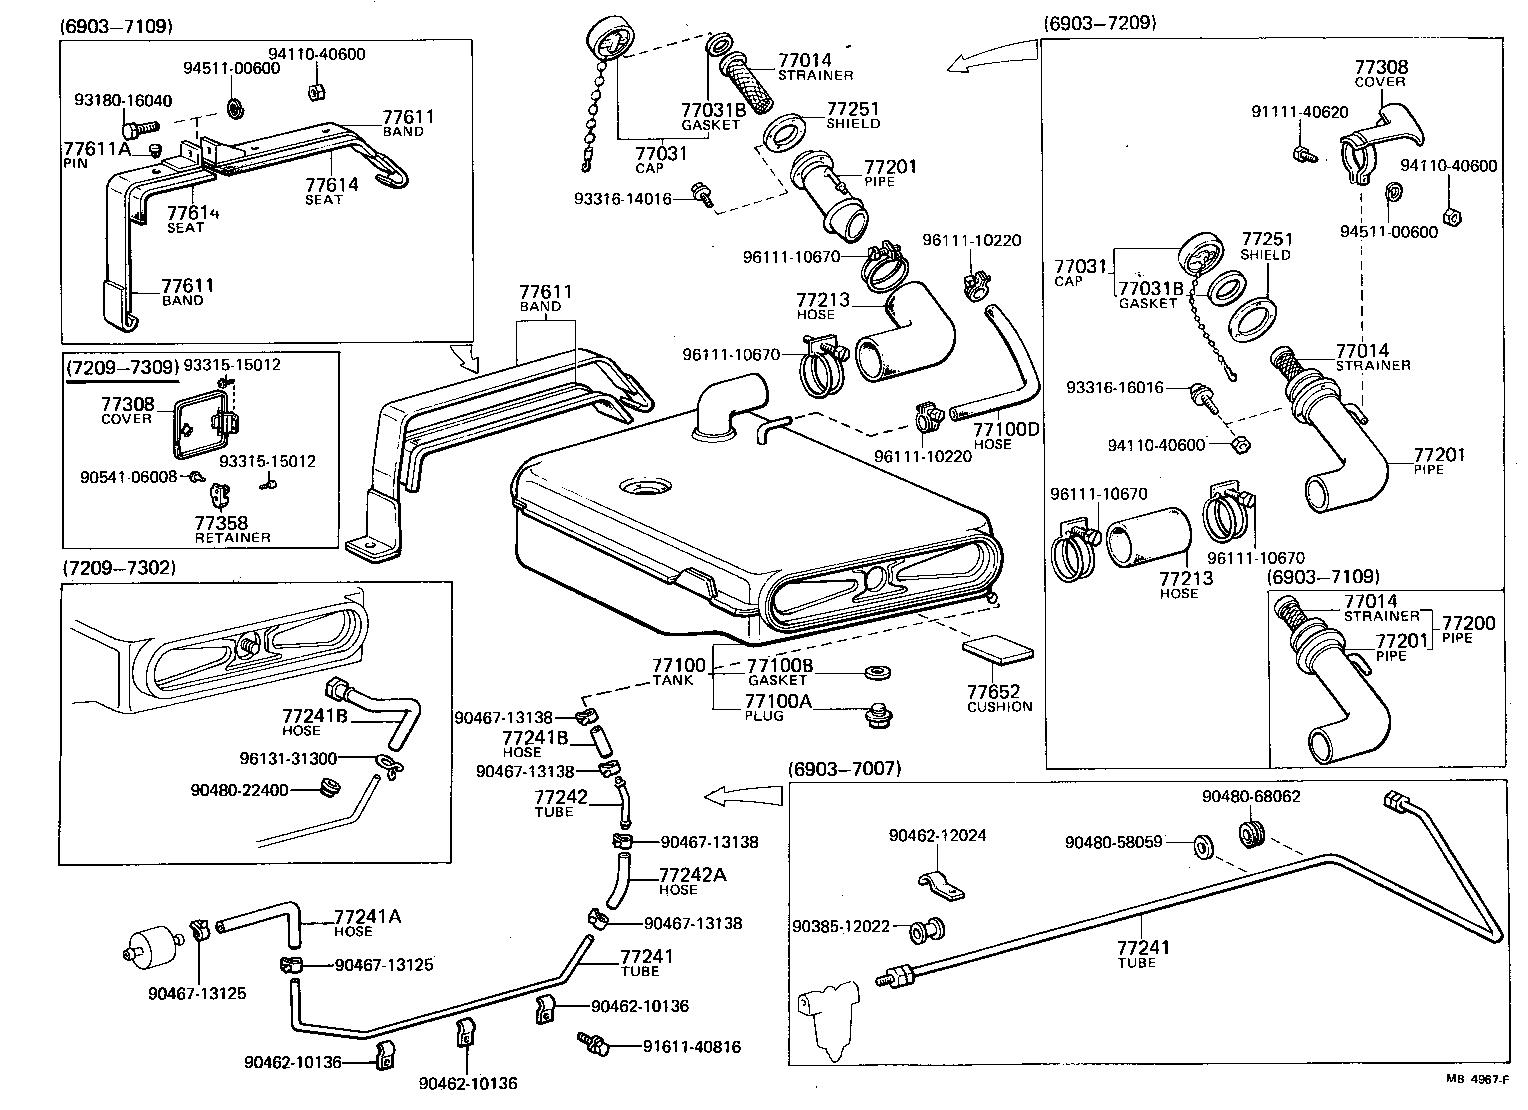 Toyota Land Cruiser Fj40 Body Parts